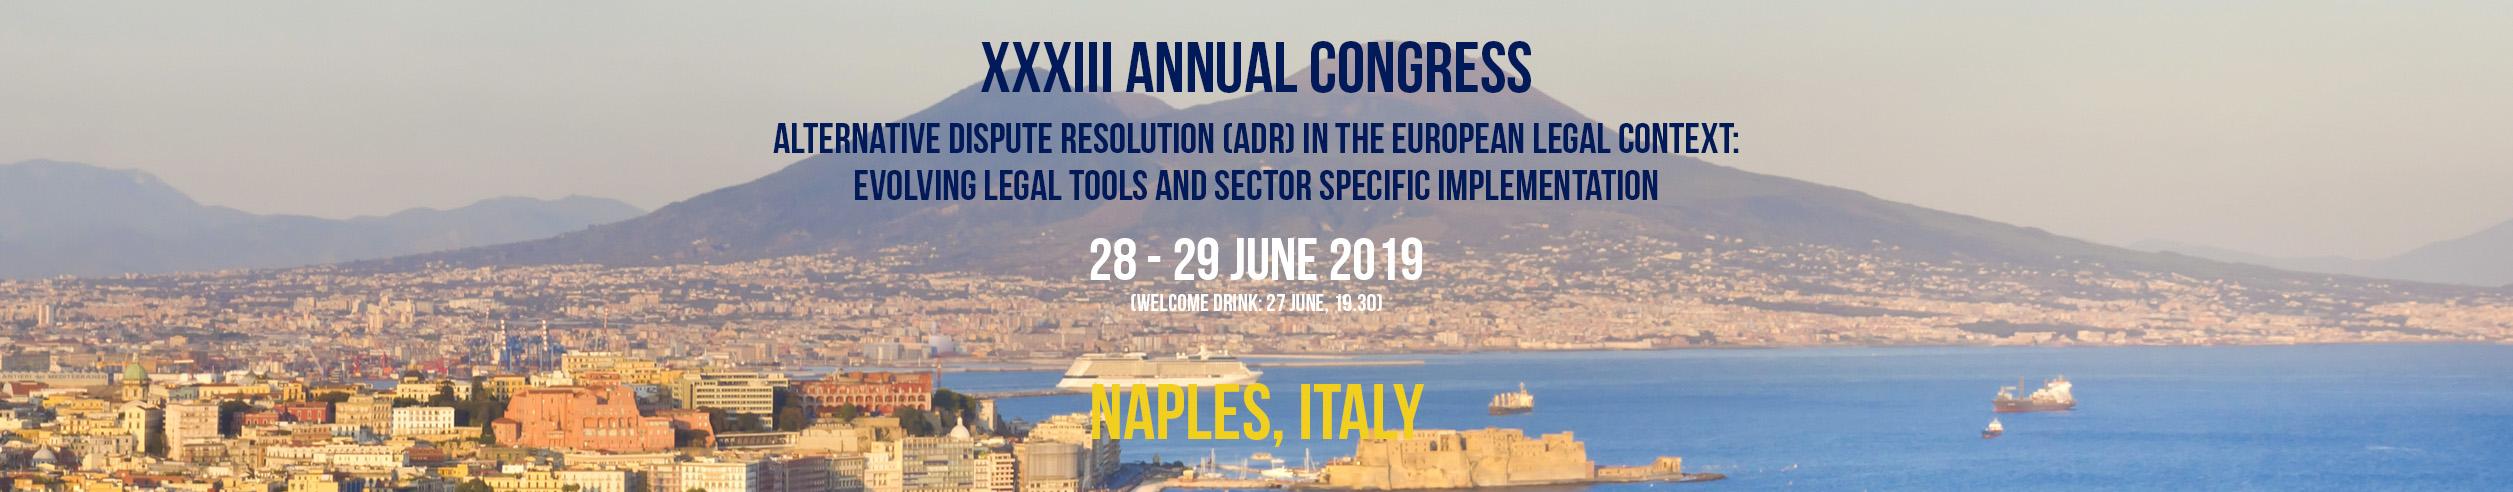 annual congress 2019